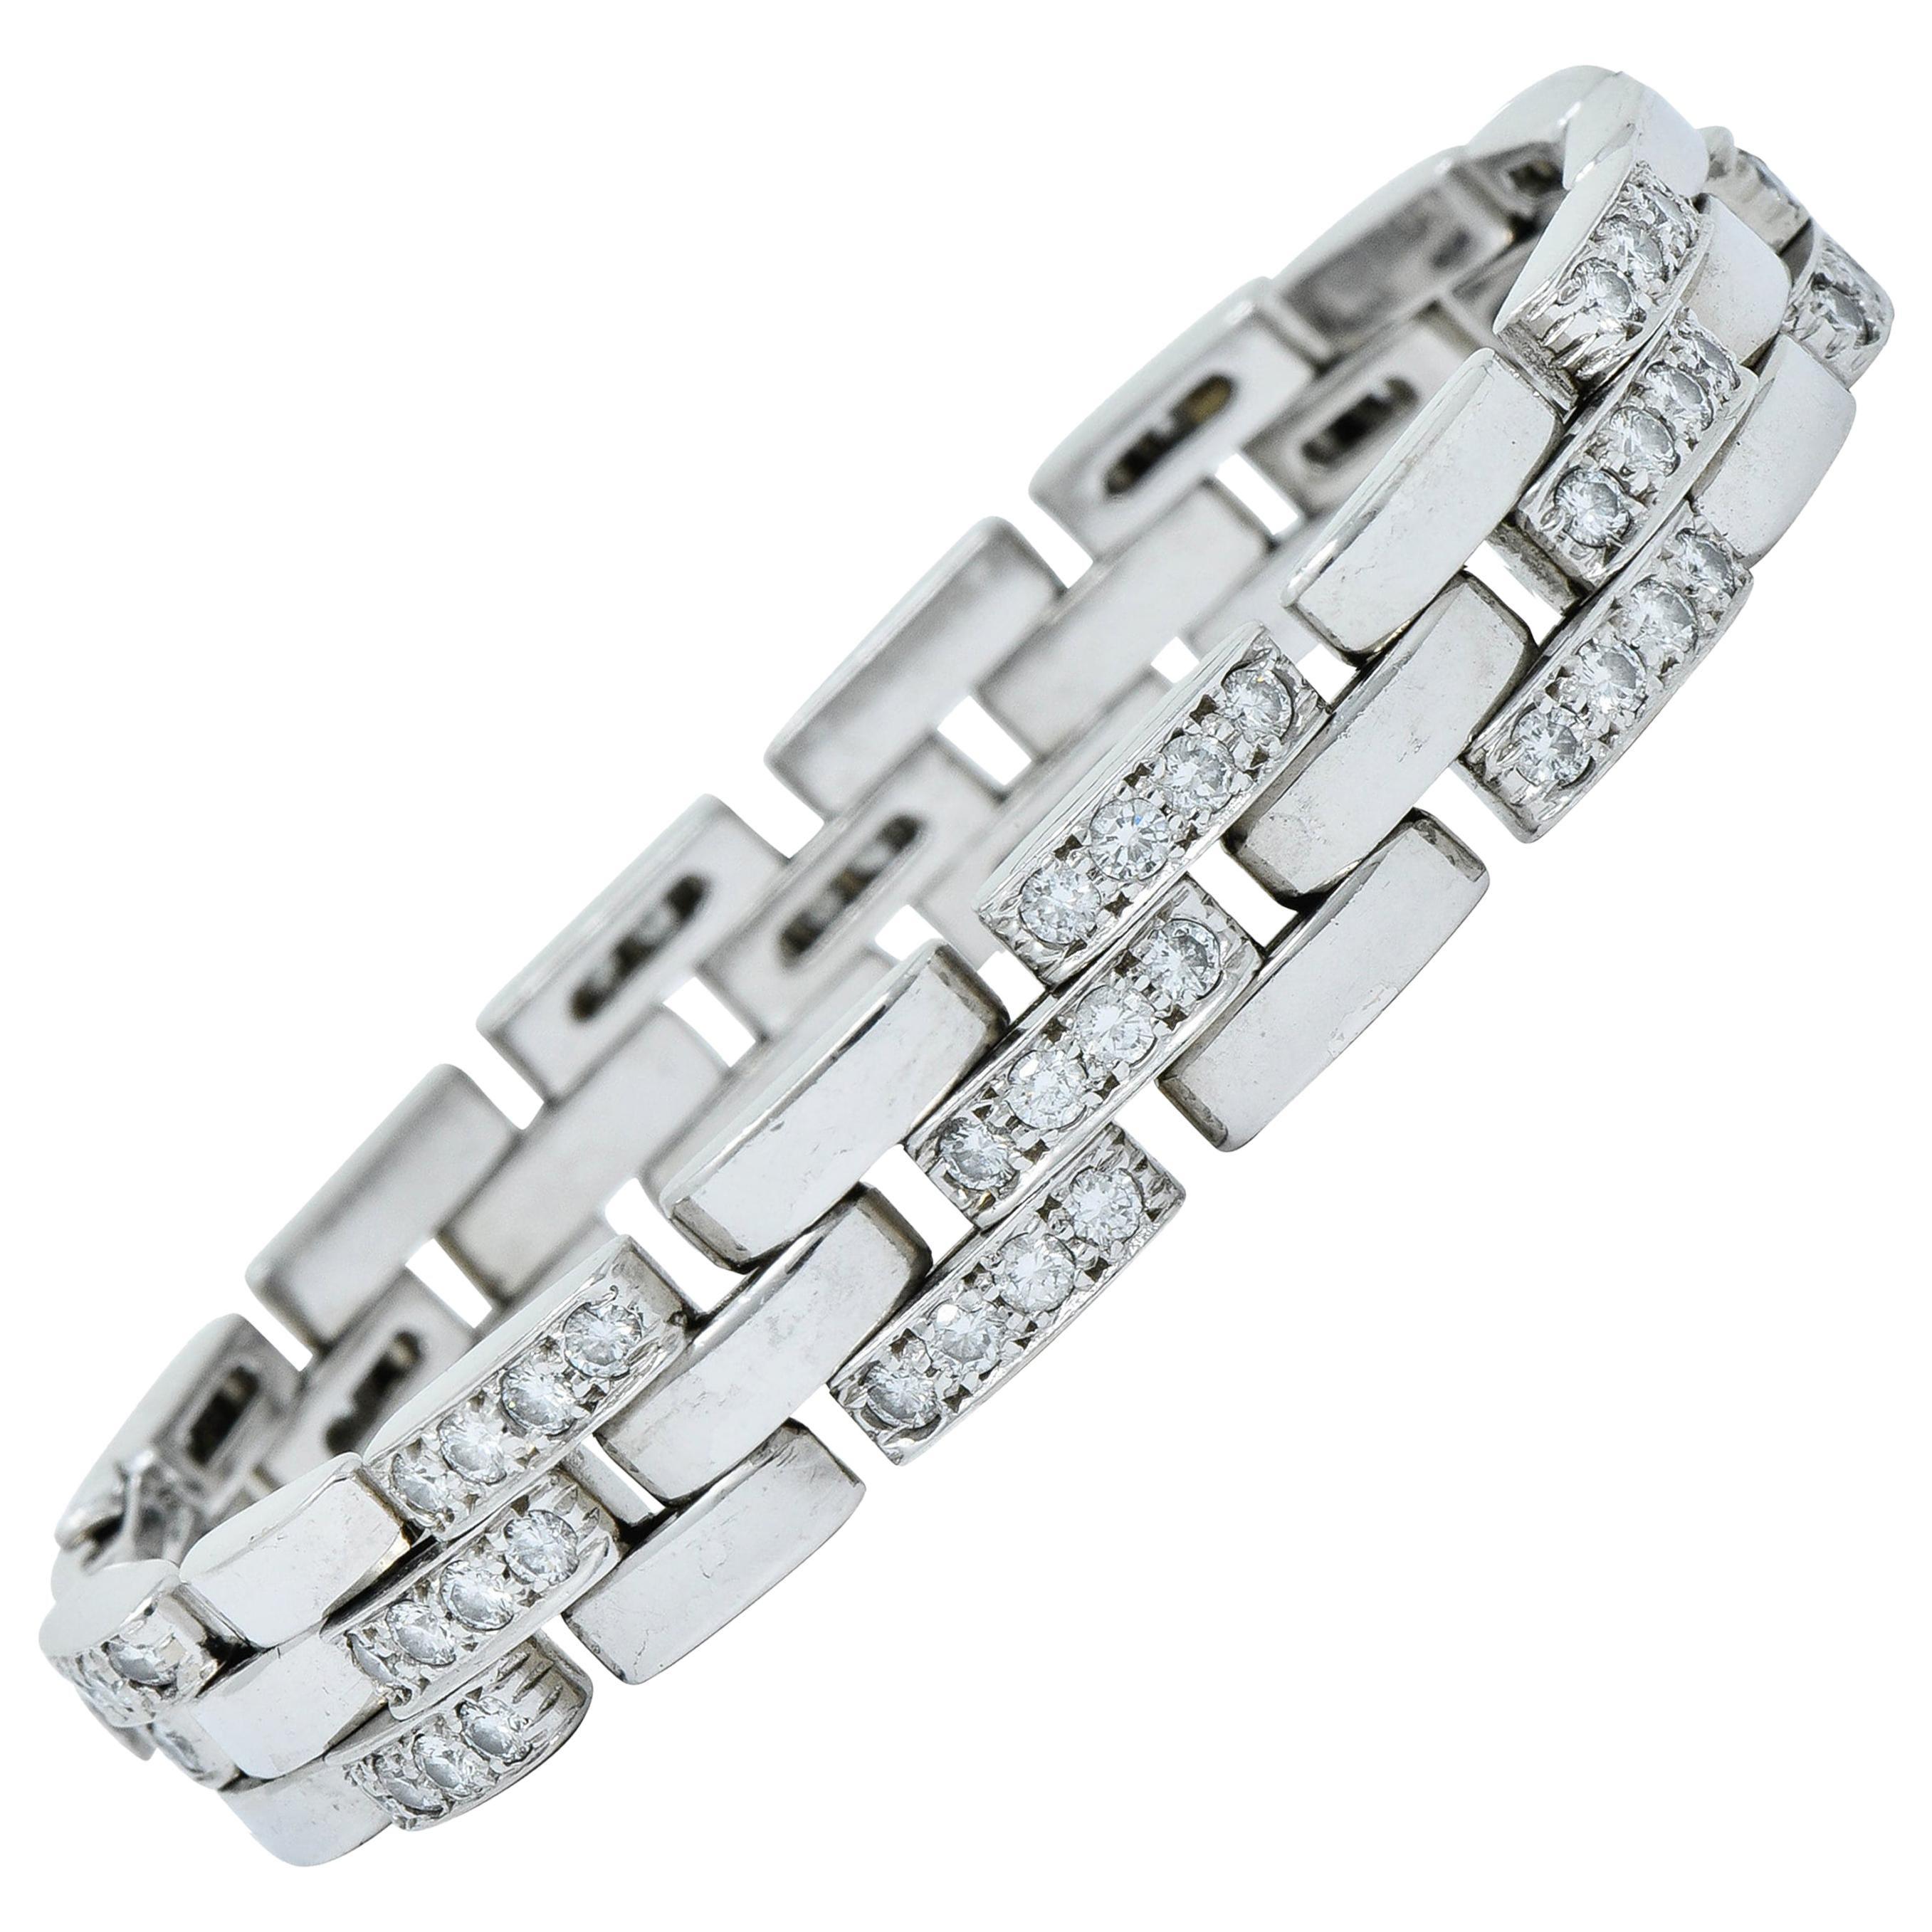 Cartier 3.36 Carat Diamond Maillon Panthere 18 Karat White Gold Link Bracelet